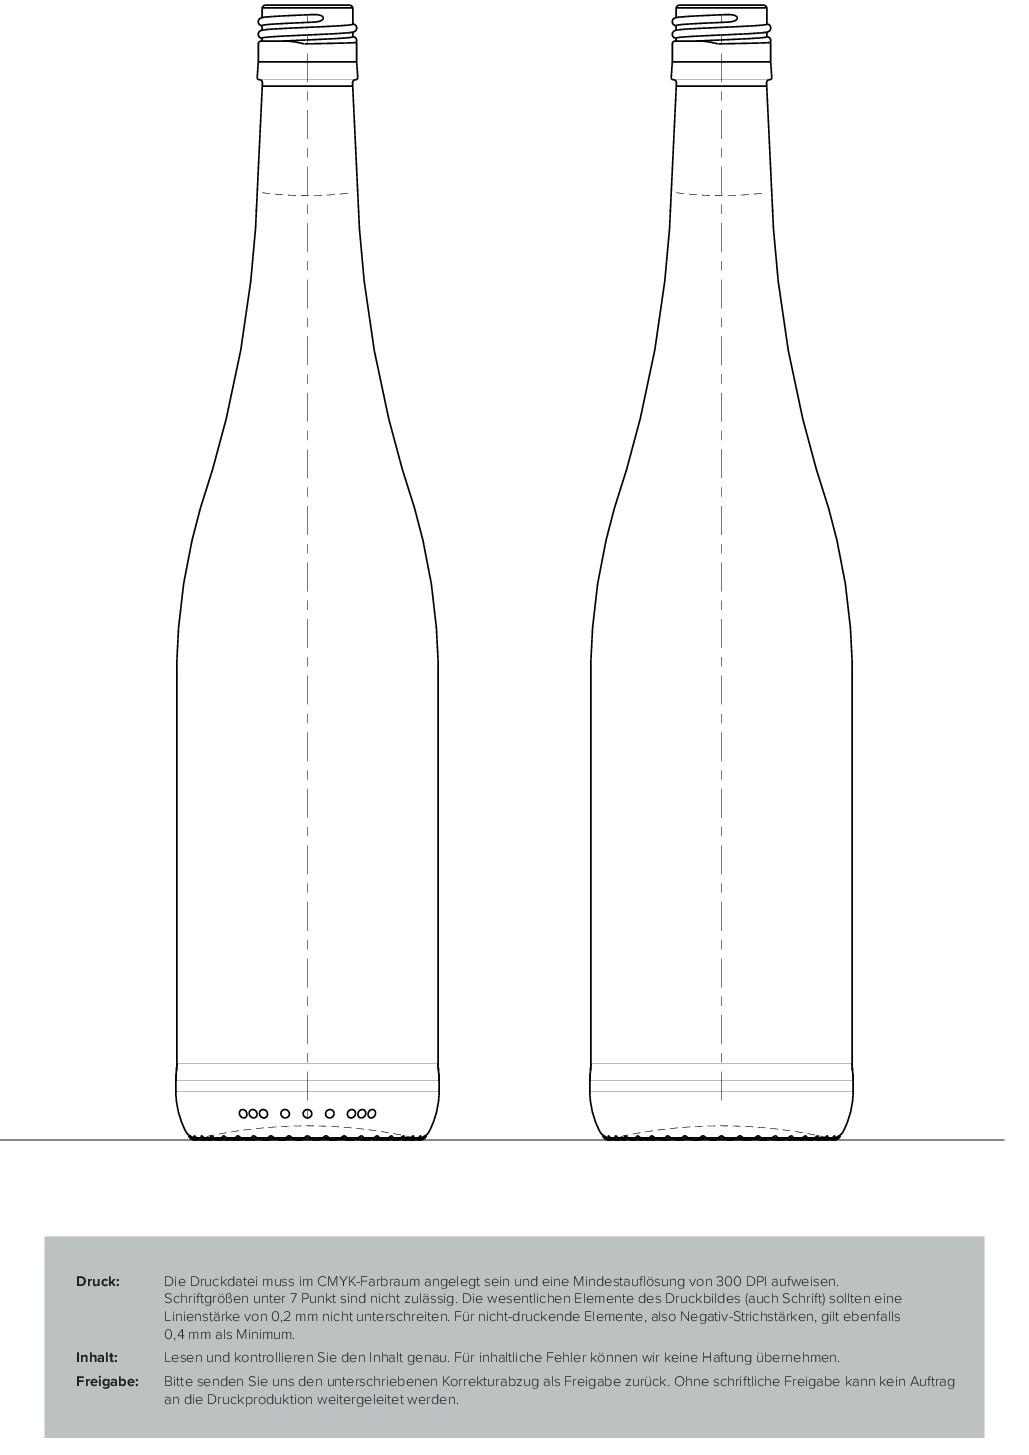 Direct Inkjet Printing on a wine bottle